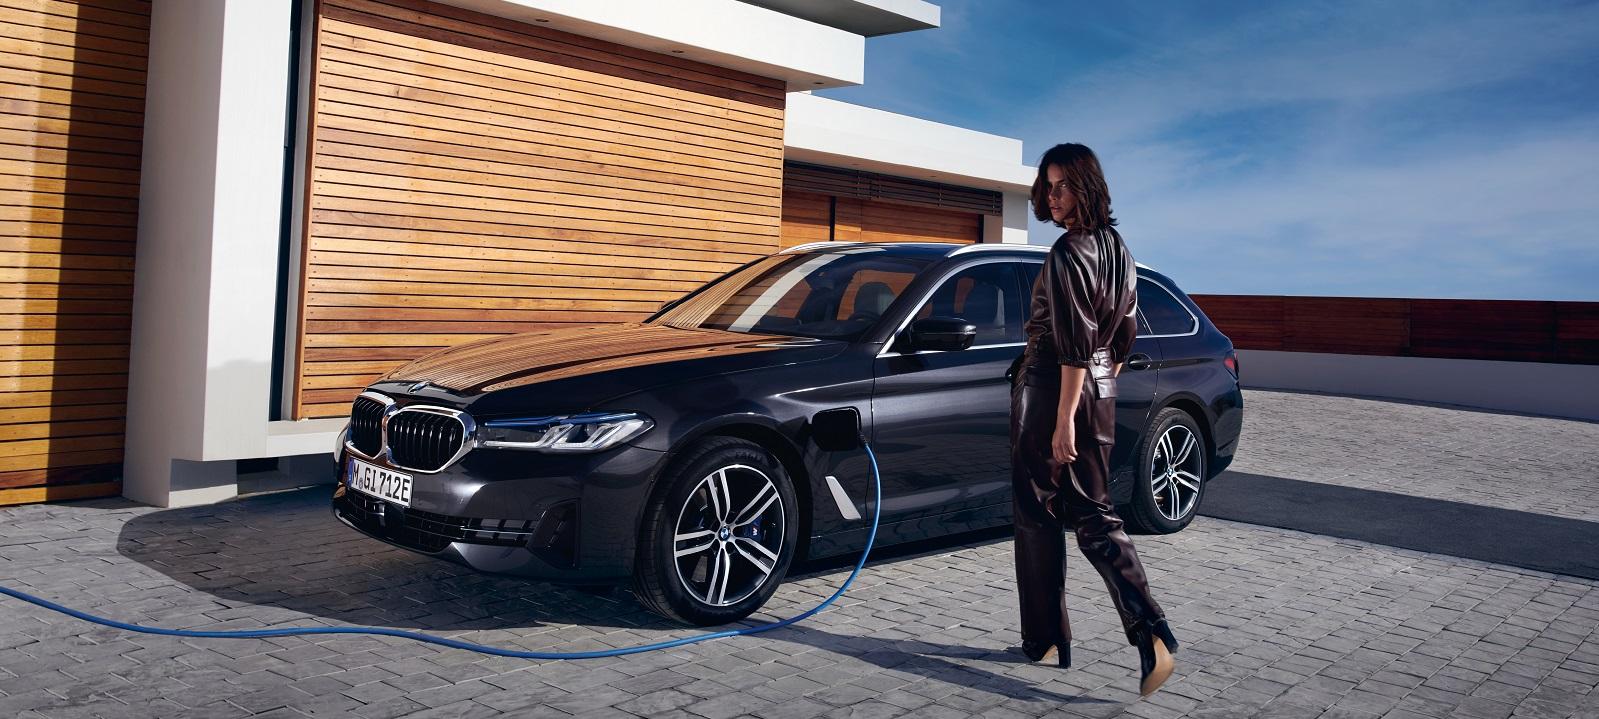 BMW Wagner - BMW X3 xDrive20d Angebot